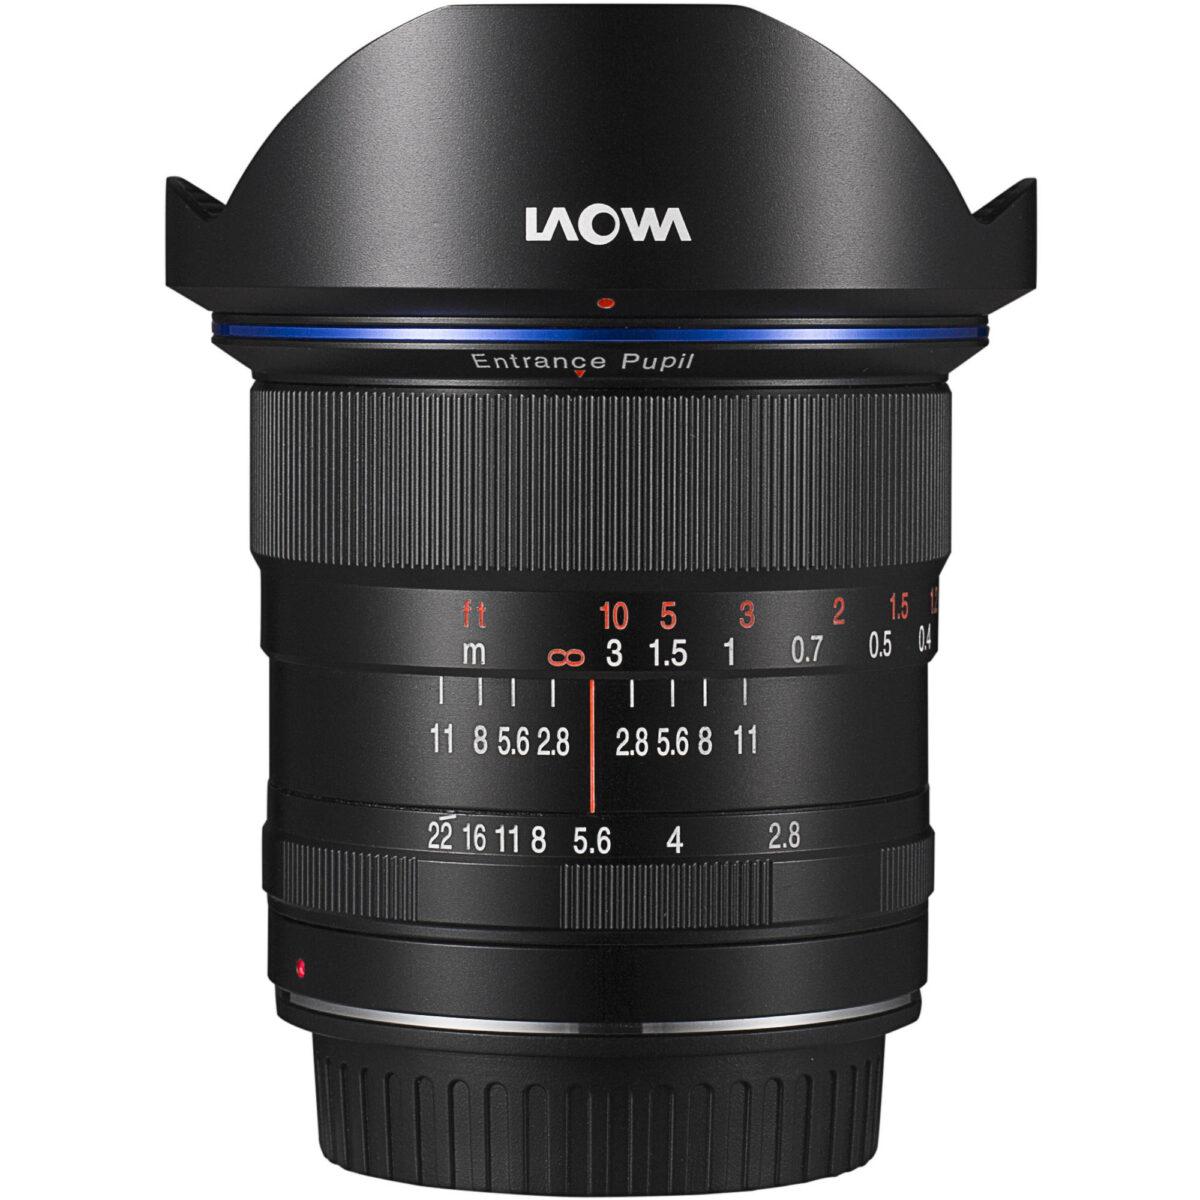 لنز ونوس لائووا Venus Optics Laowa 12mm f/2.8 Zero-D for Sony E